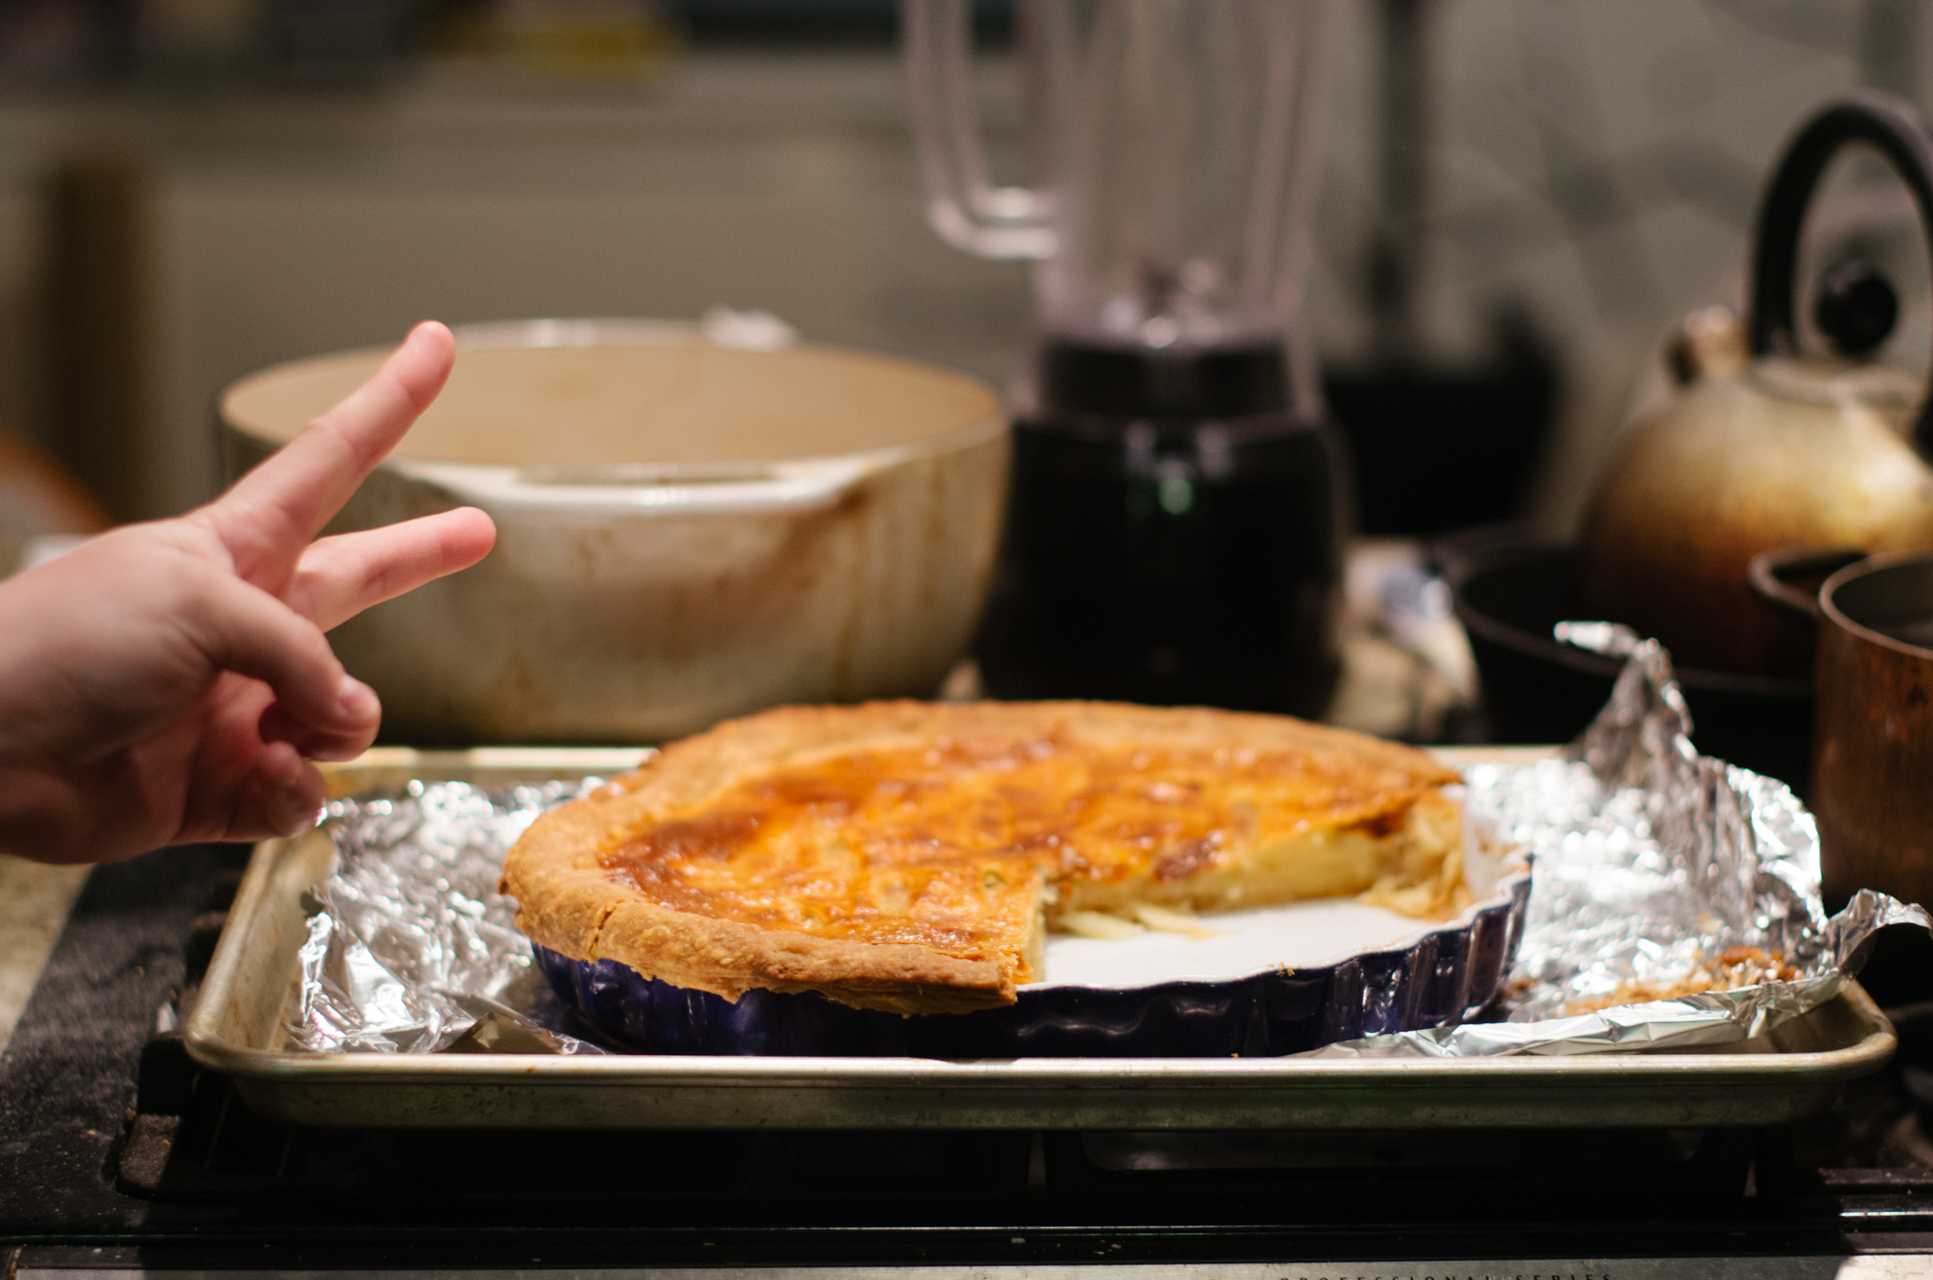 I had  tart dough  (Samin Nosrat,  Salt, Fat, Acid, Heat ) hanging around my freezer so I defrosted it and made this  Savory Potato Tart  (David Tanis for the New York Times).